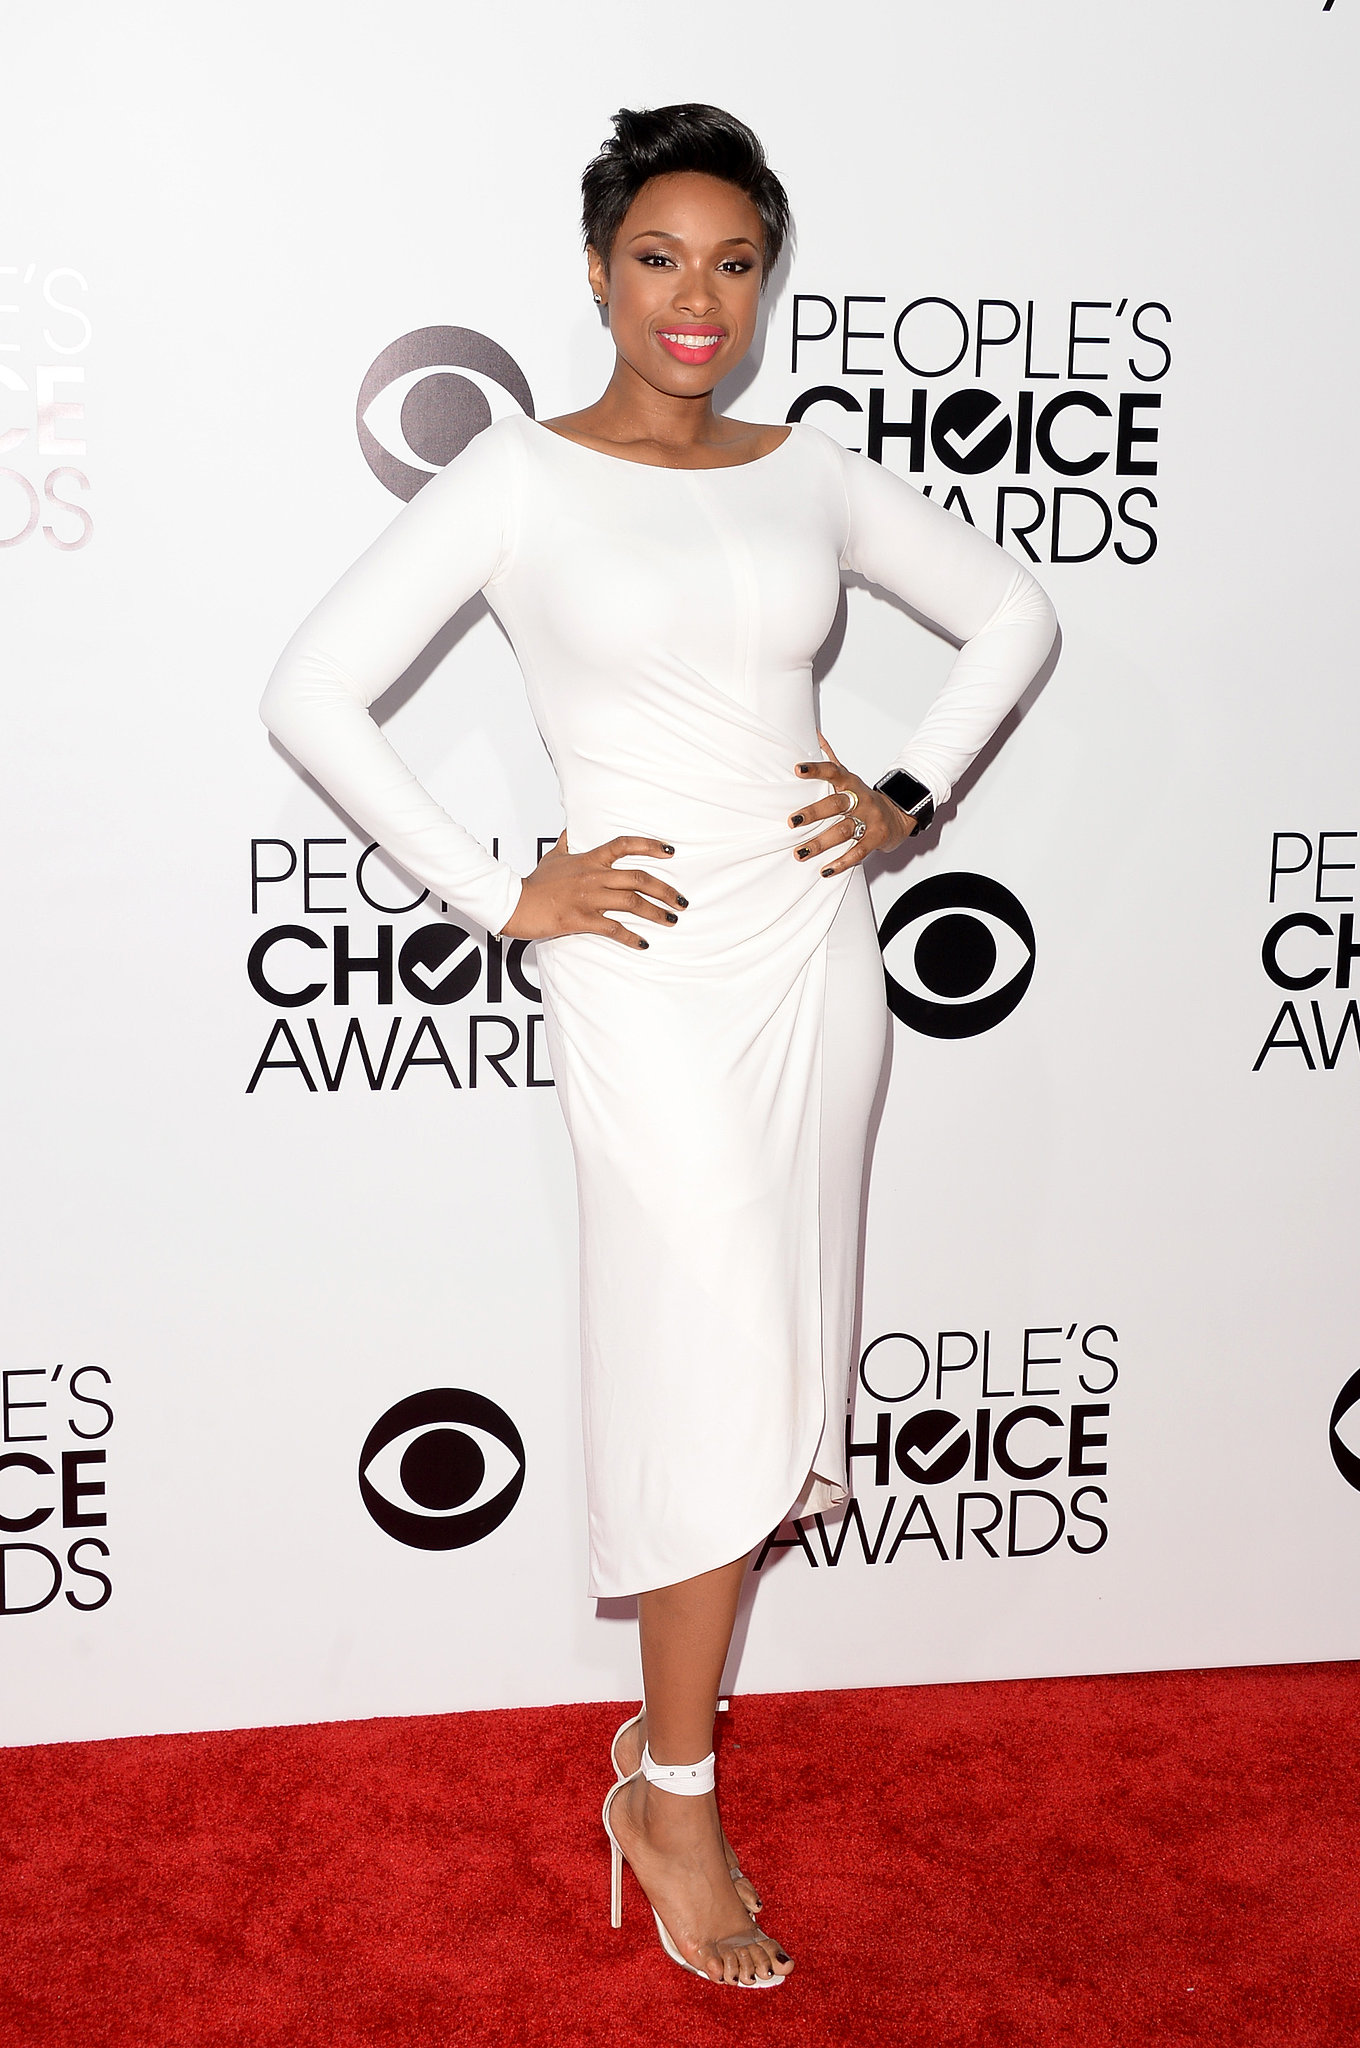 Jennifer Hudson dropped jaws on the red carpet in her sleek white dress.